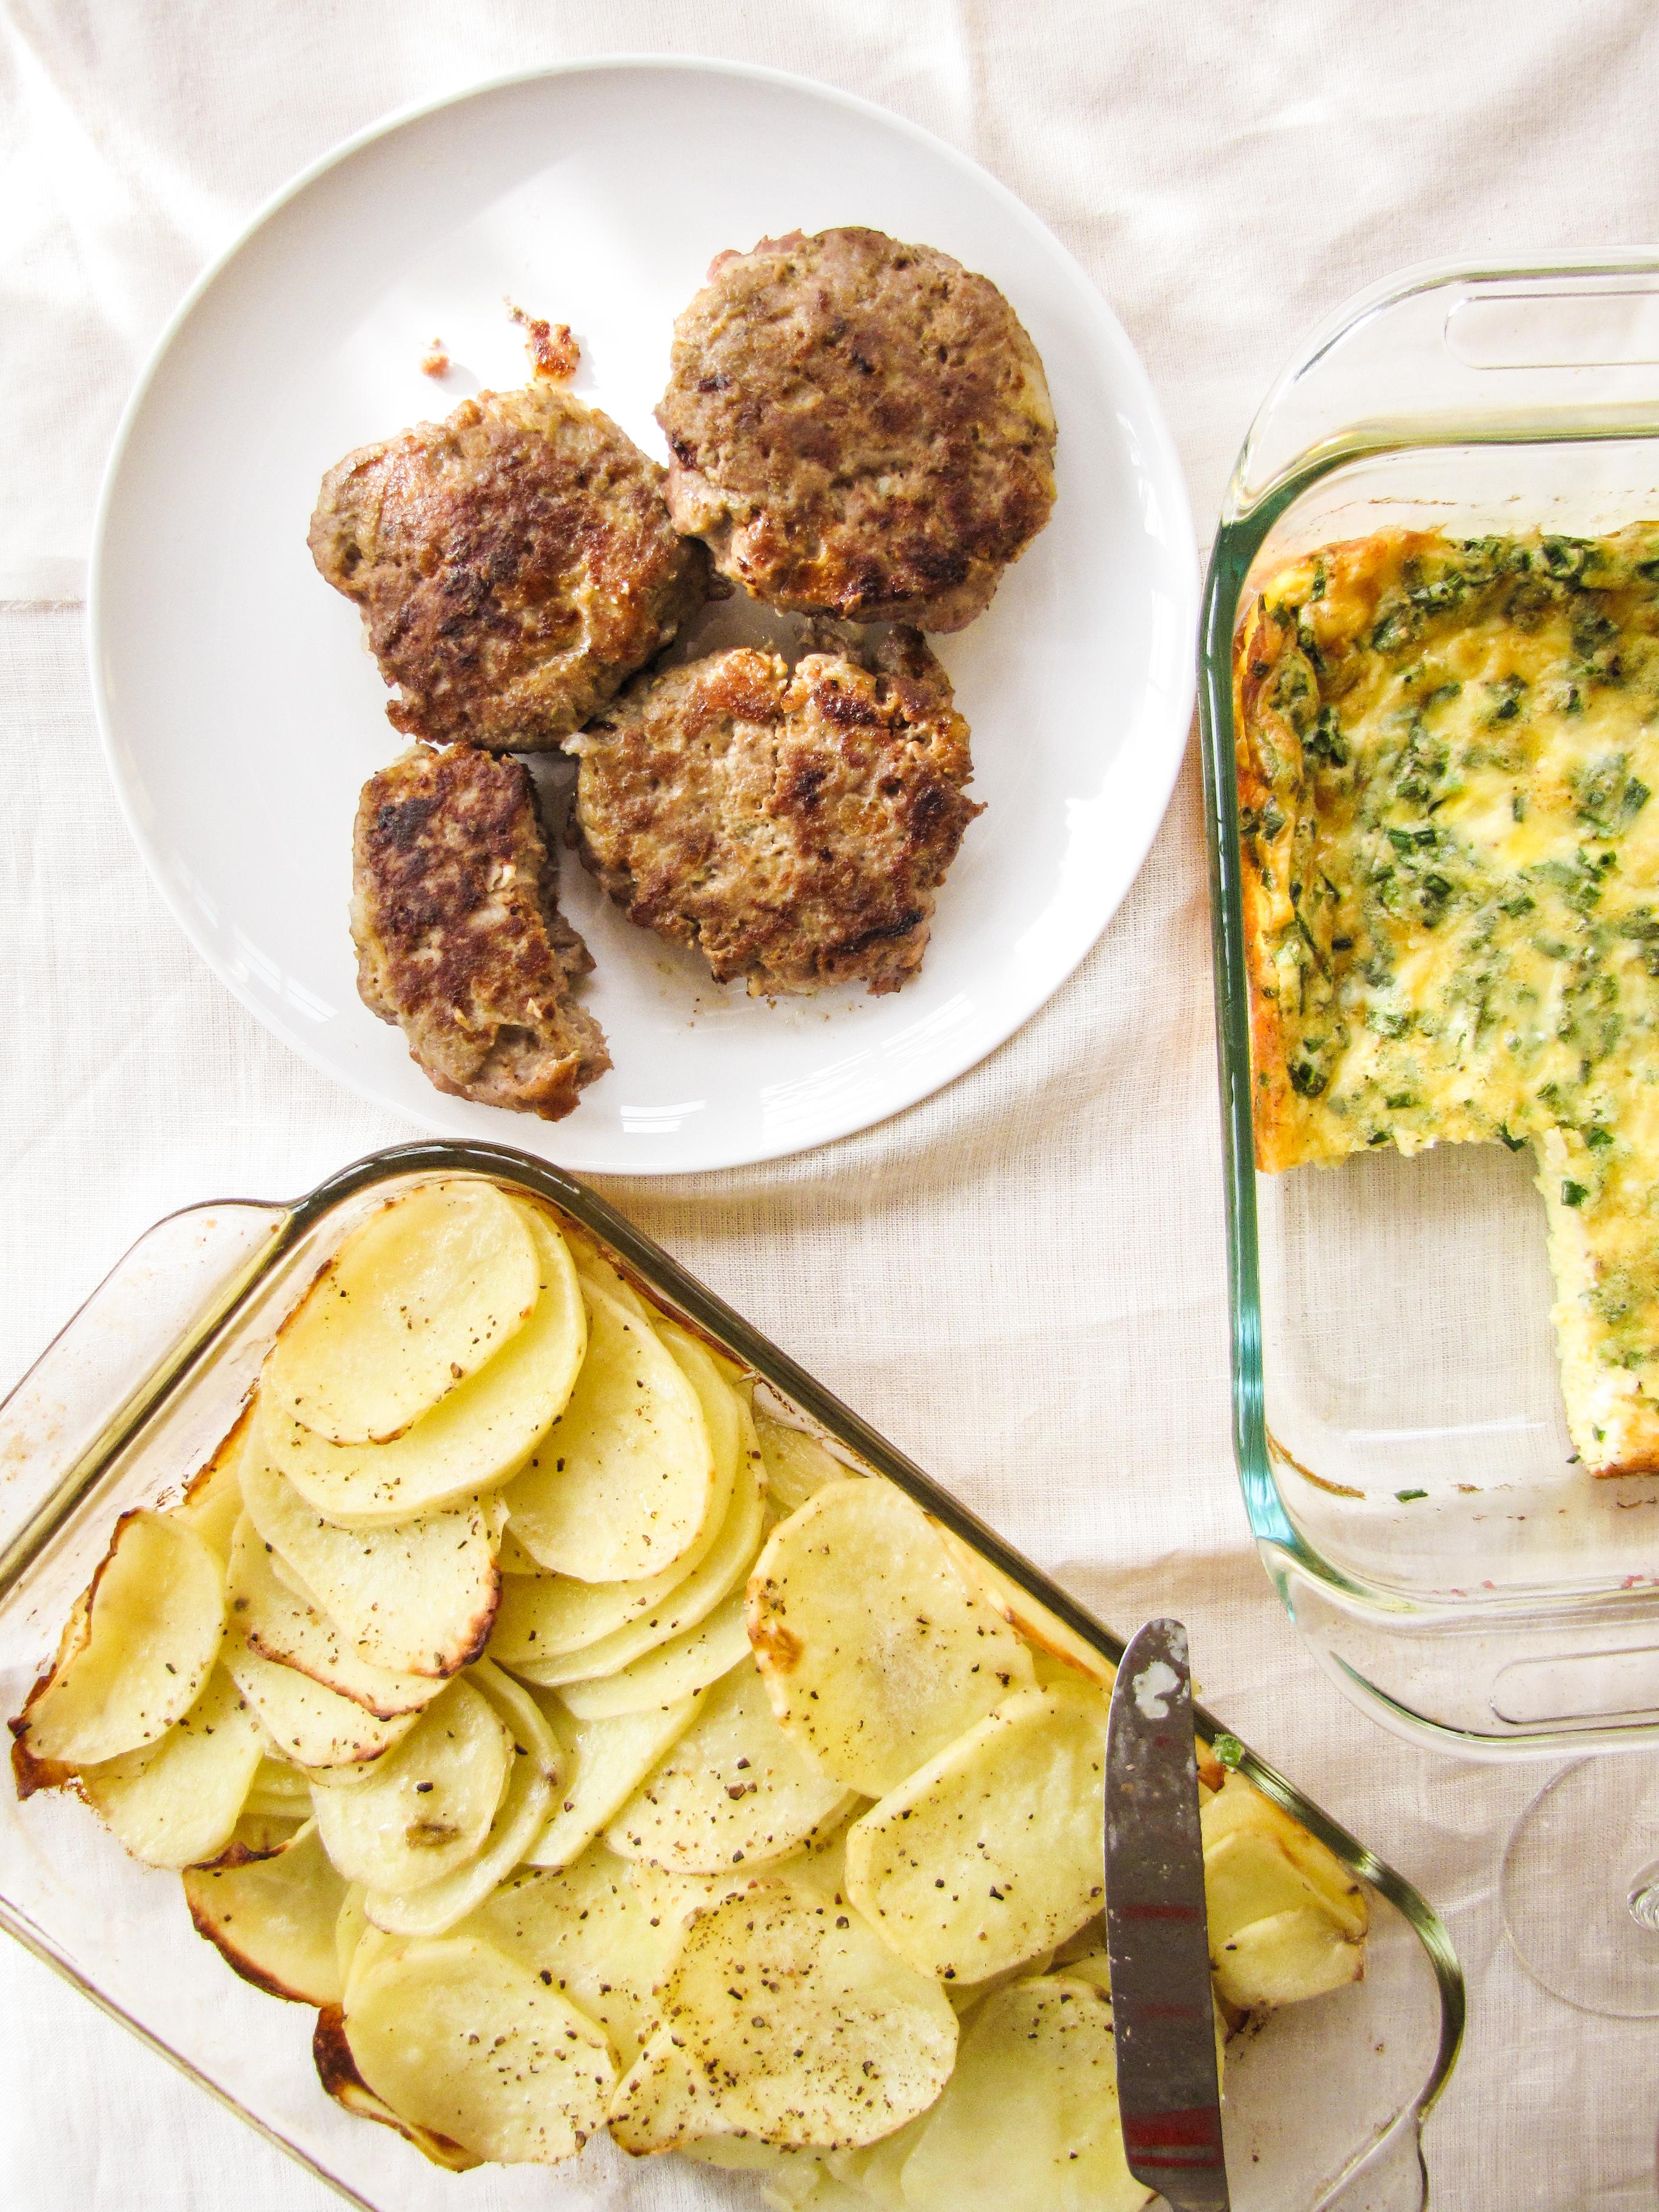 Christmas Morning Brunch - Spiced Turkey Sausage, Gruyere Egg Custard, Buttered Potatoes {Katie at the Kitchen Door}